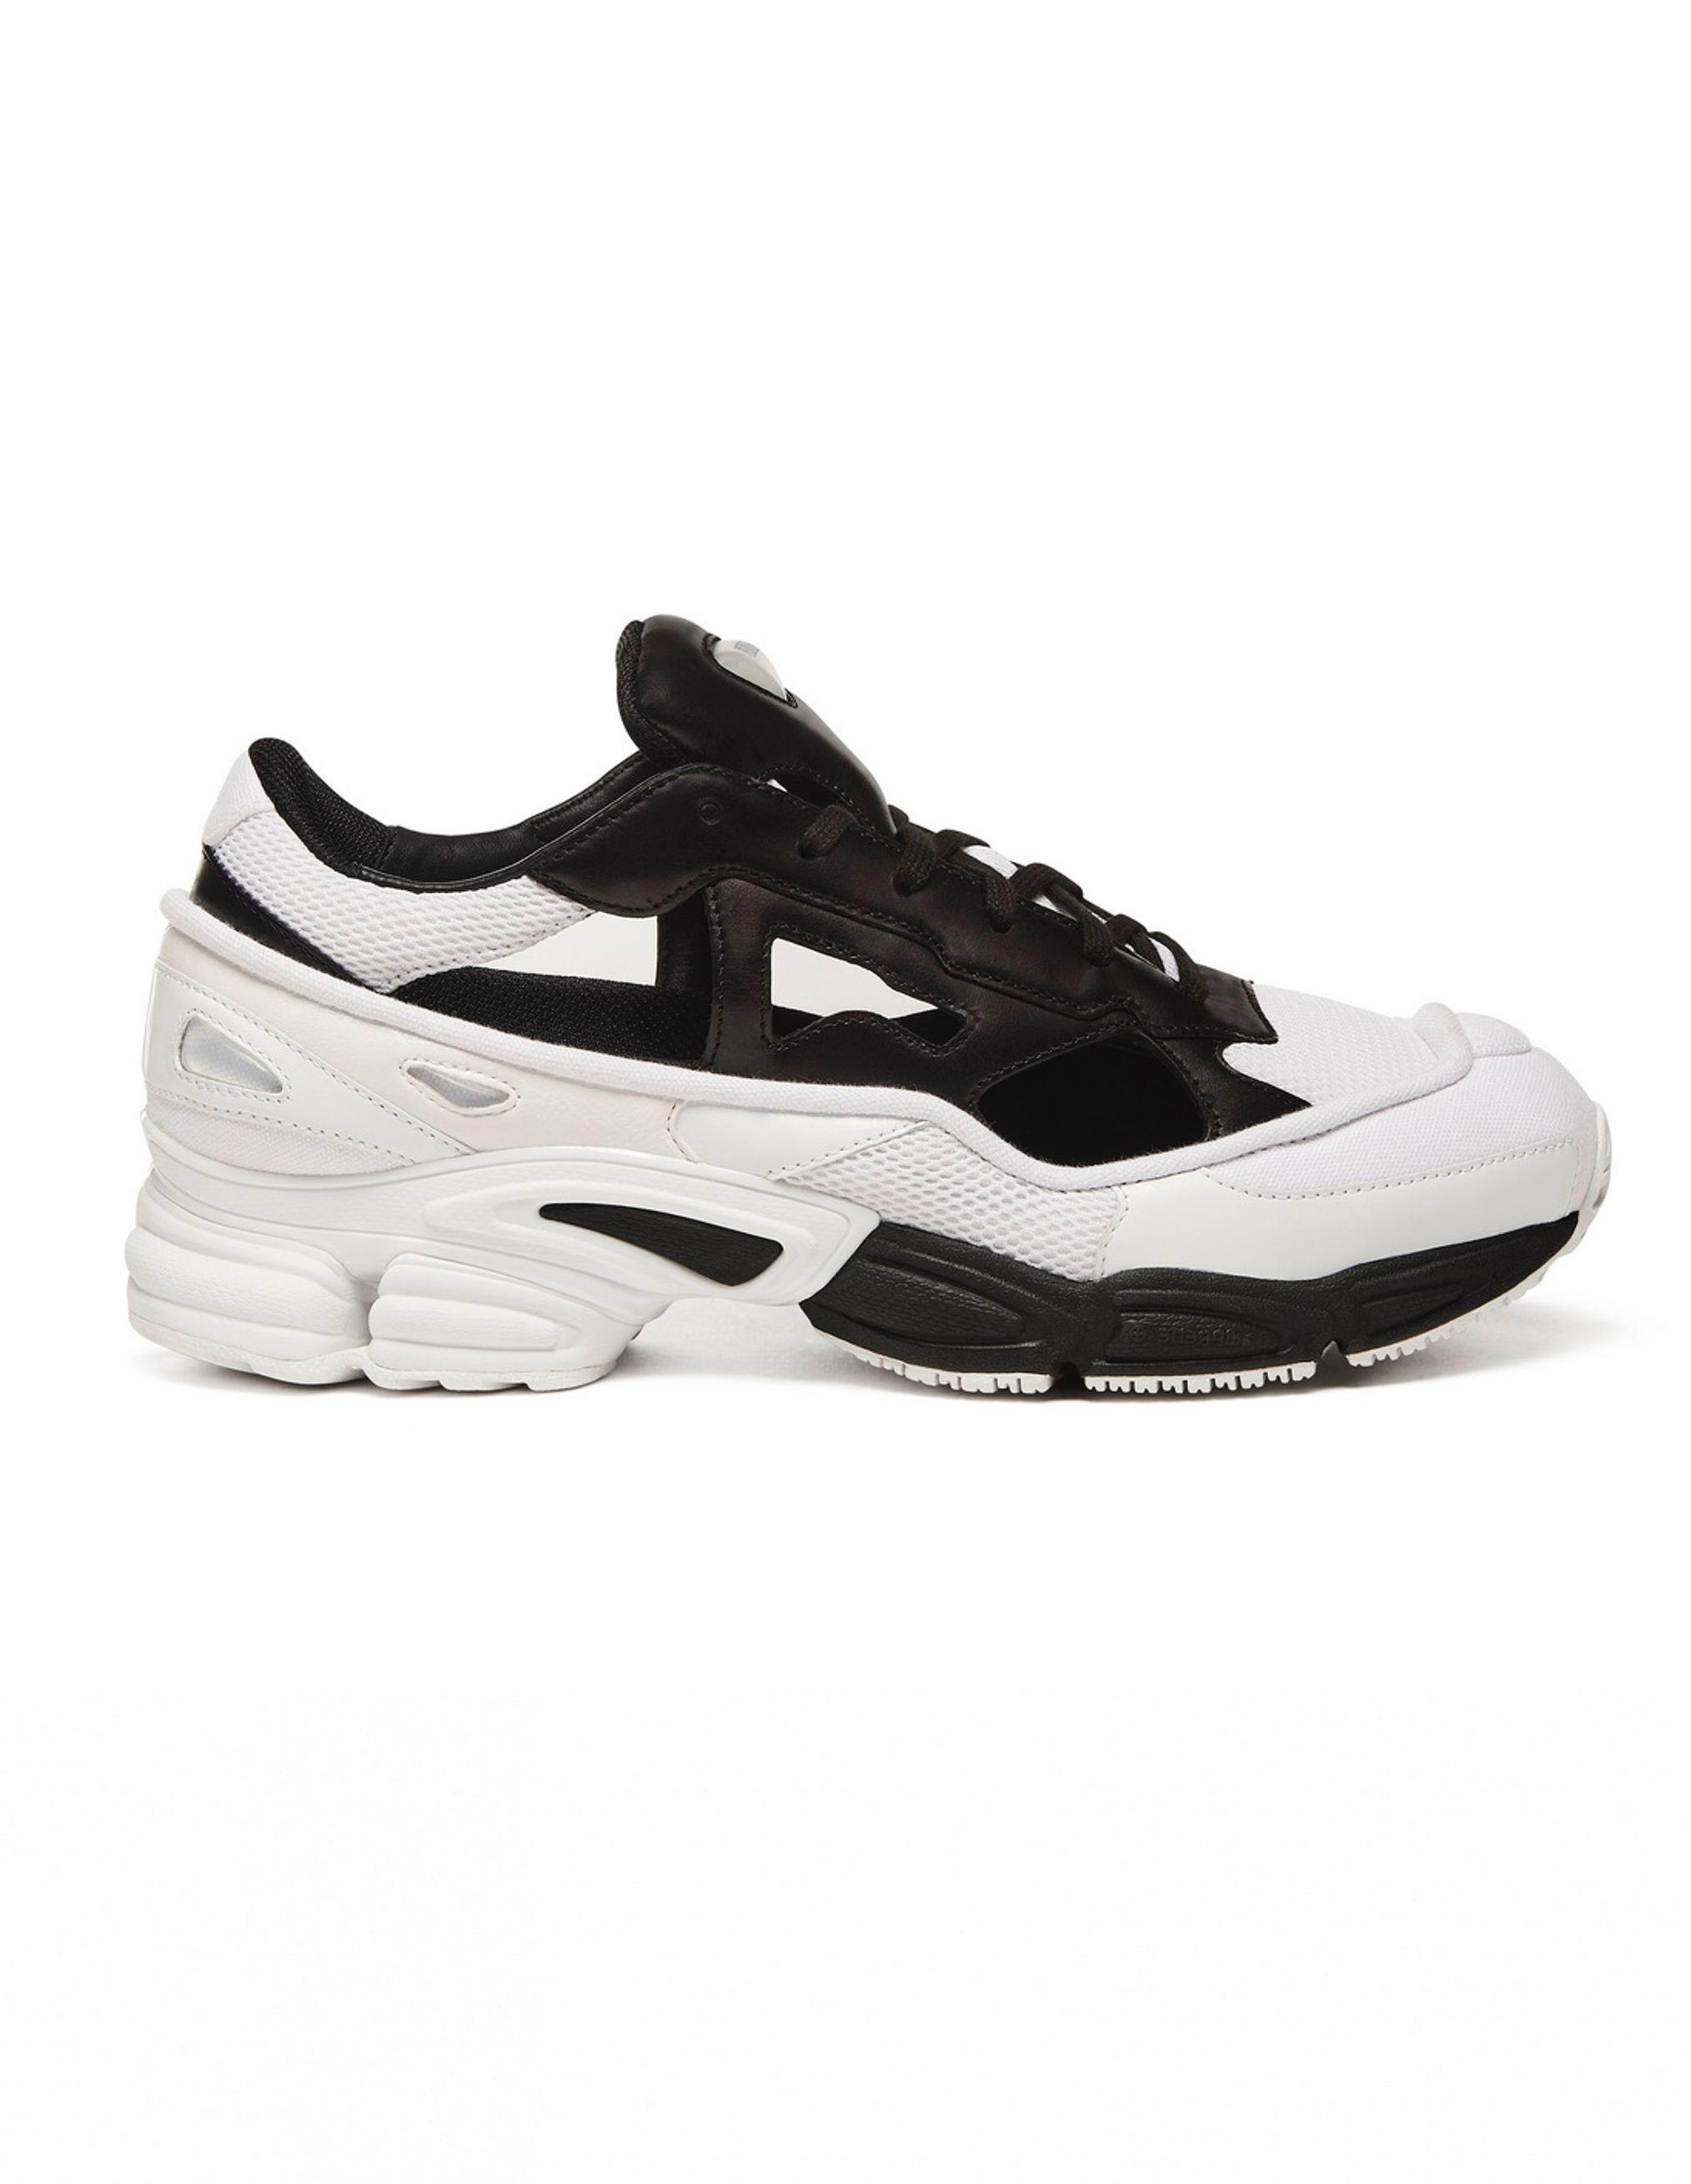 wholesale dealer 67a6d 2903e RAF SIMONS REPLICANT OZWEEGO SNEAKERS.  rafsimons  shoes